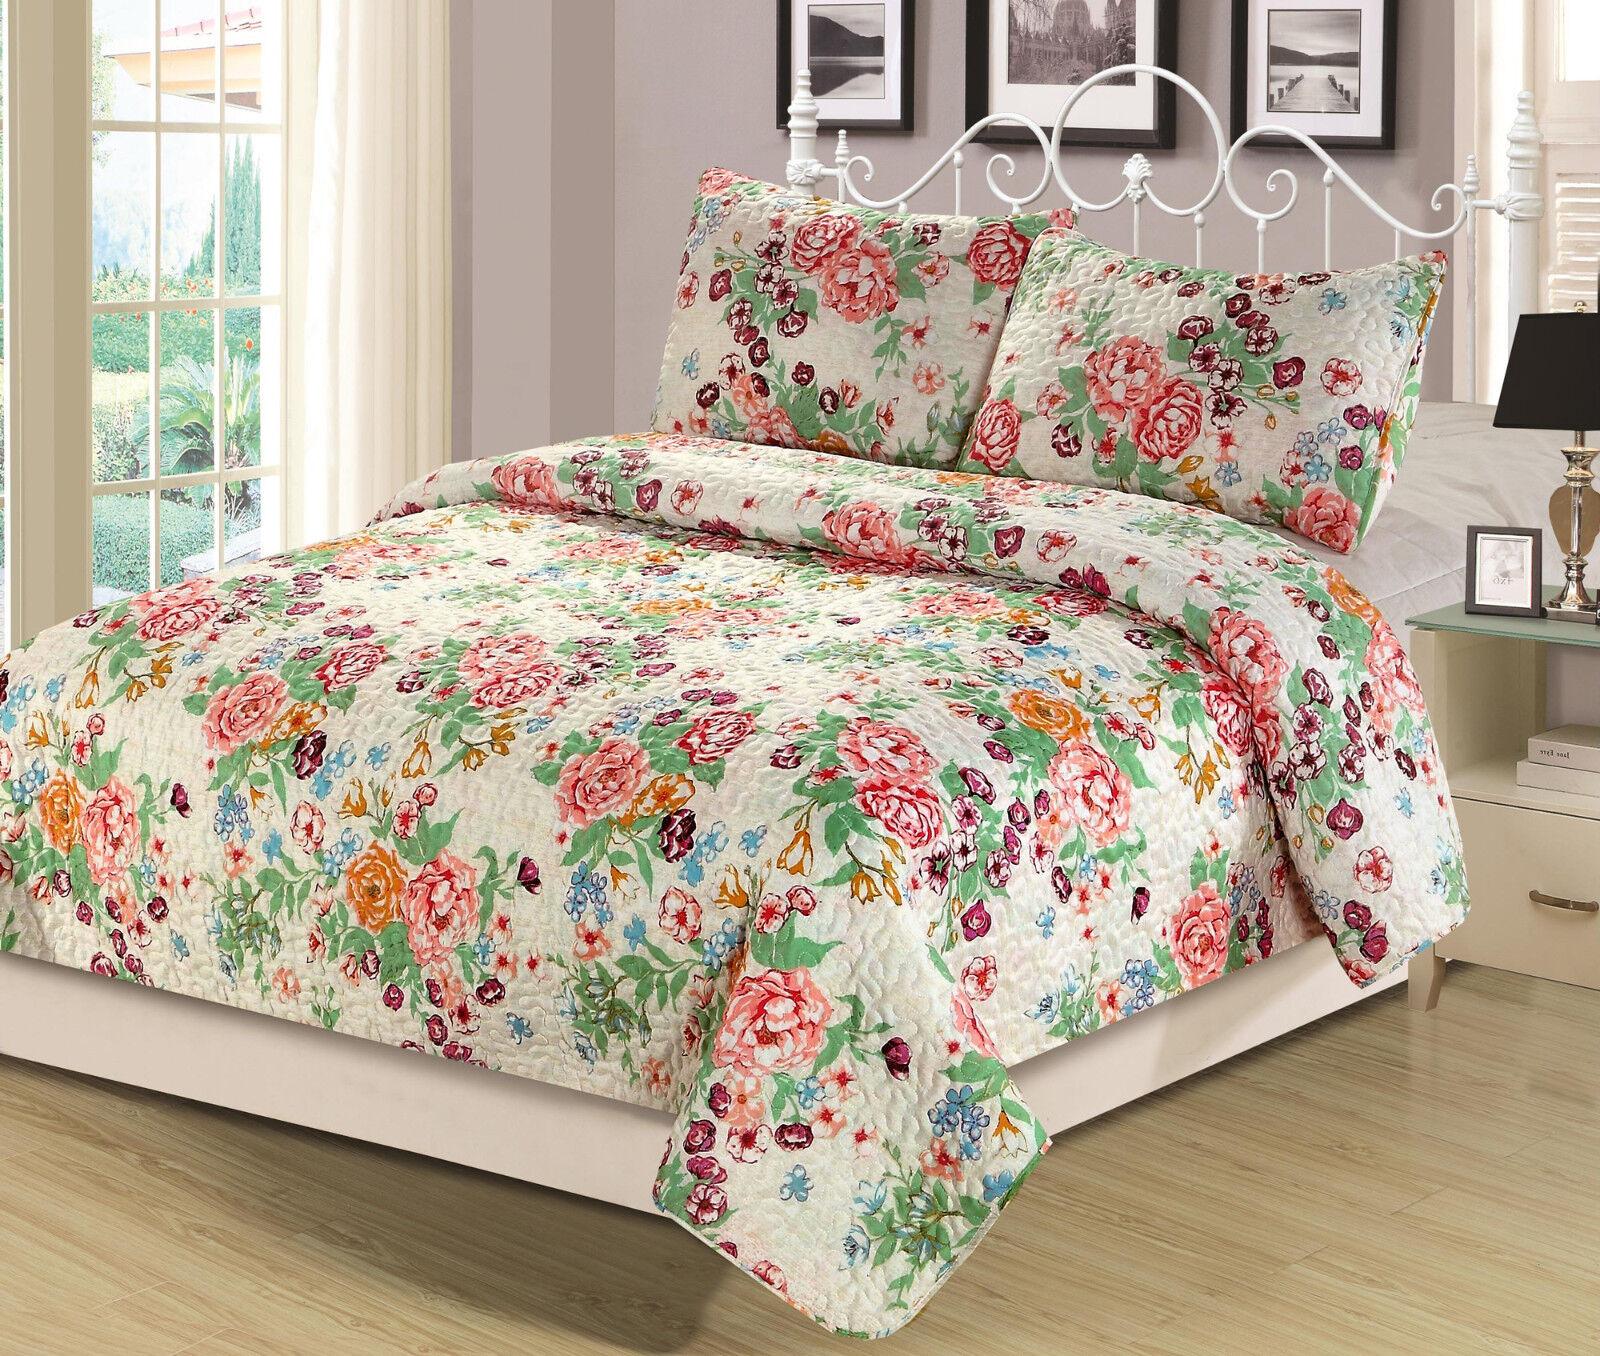 Full/Queen or King Quilt Floral Pink Blue Orange Flowers Bed